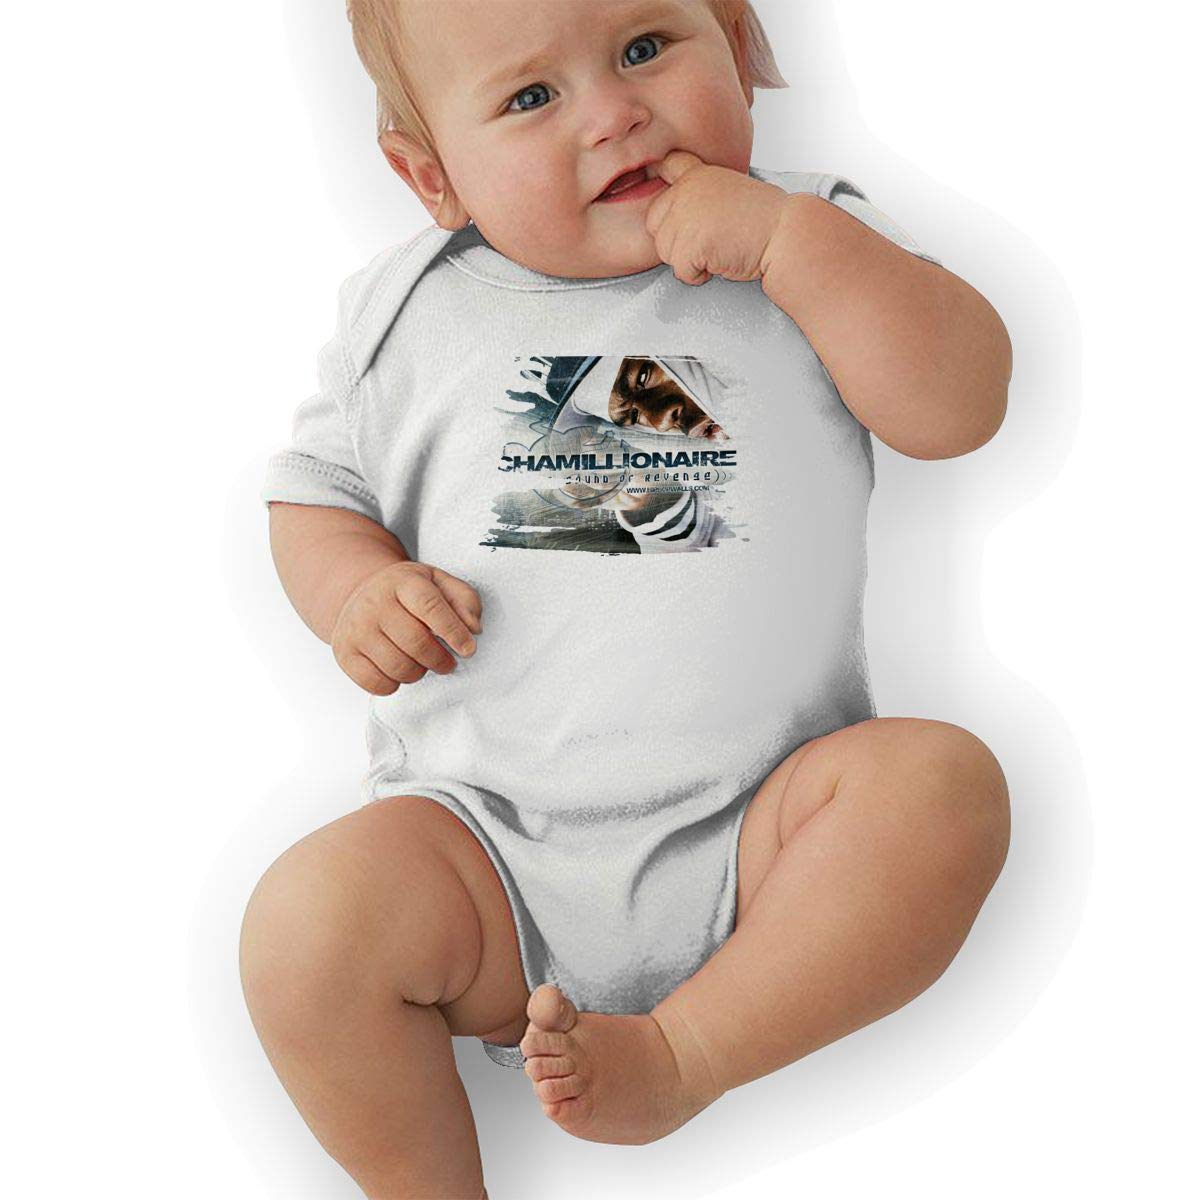 Chamillionaire The Sound of Revenge Music Band Short Sleeve Baby Bodysuit Tennis Baby Suit Gift